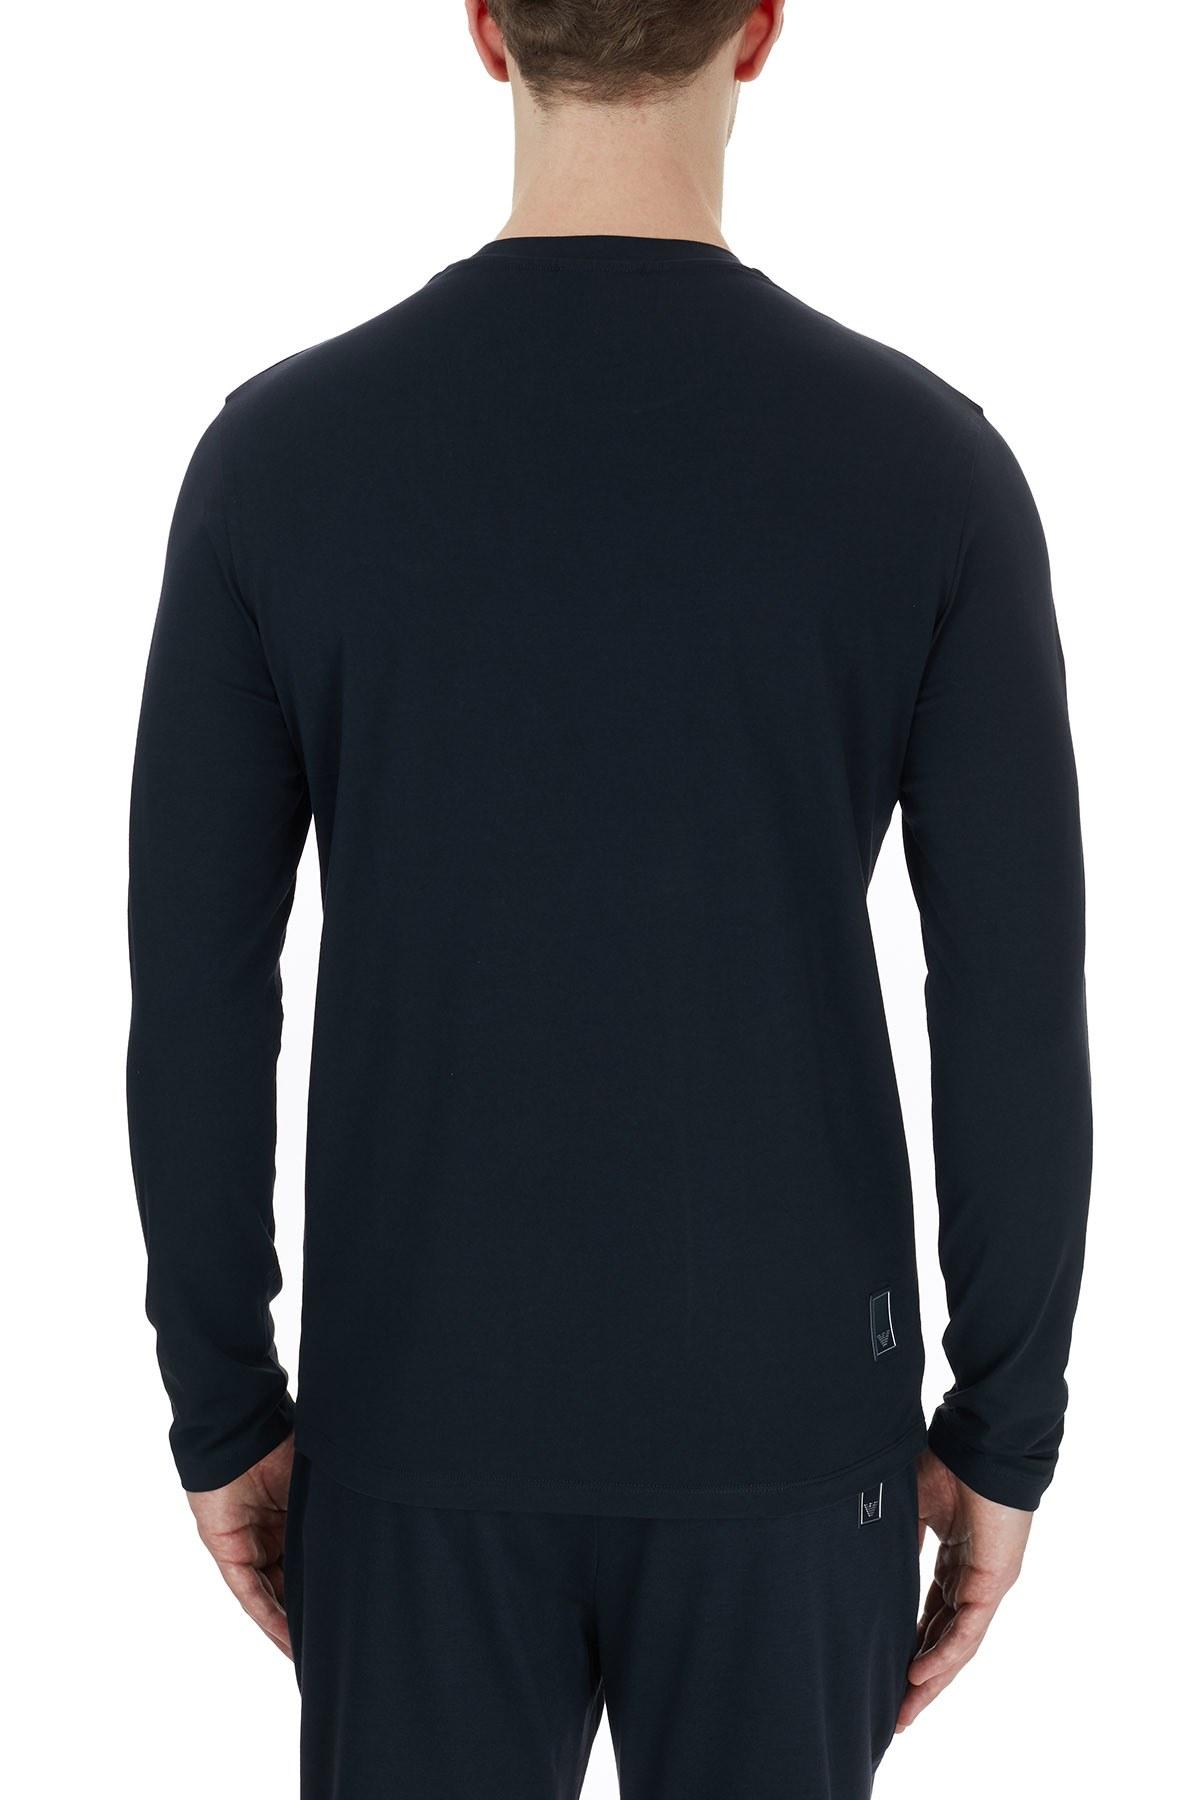 Emporio Armani Bisiklet Yaka Pamuklu Erkek T Shirt 6H1TS3 1JJRZ 0920 LACİVERT